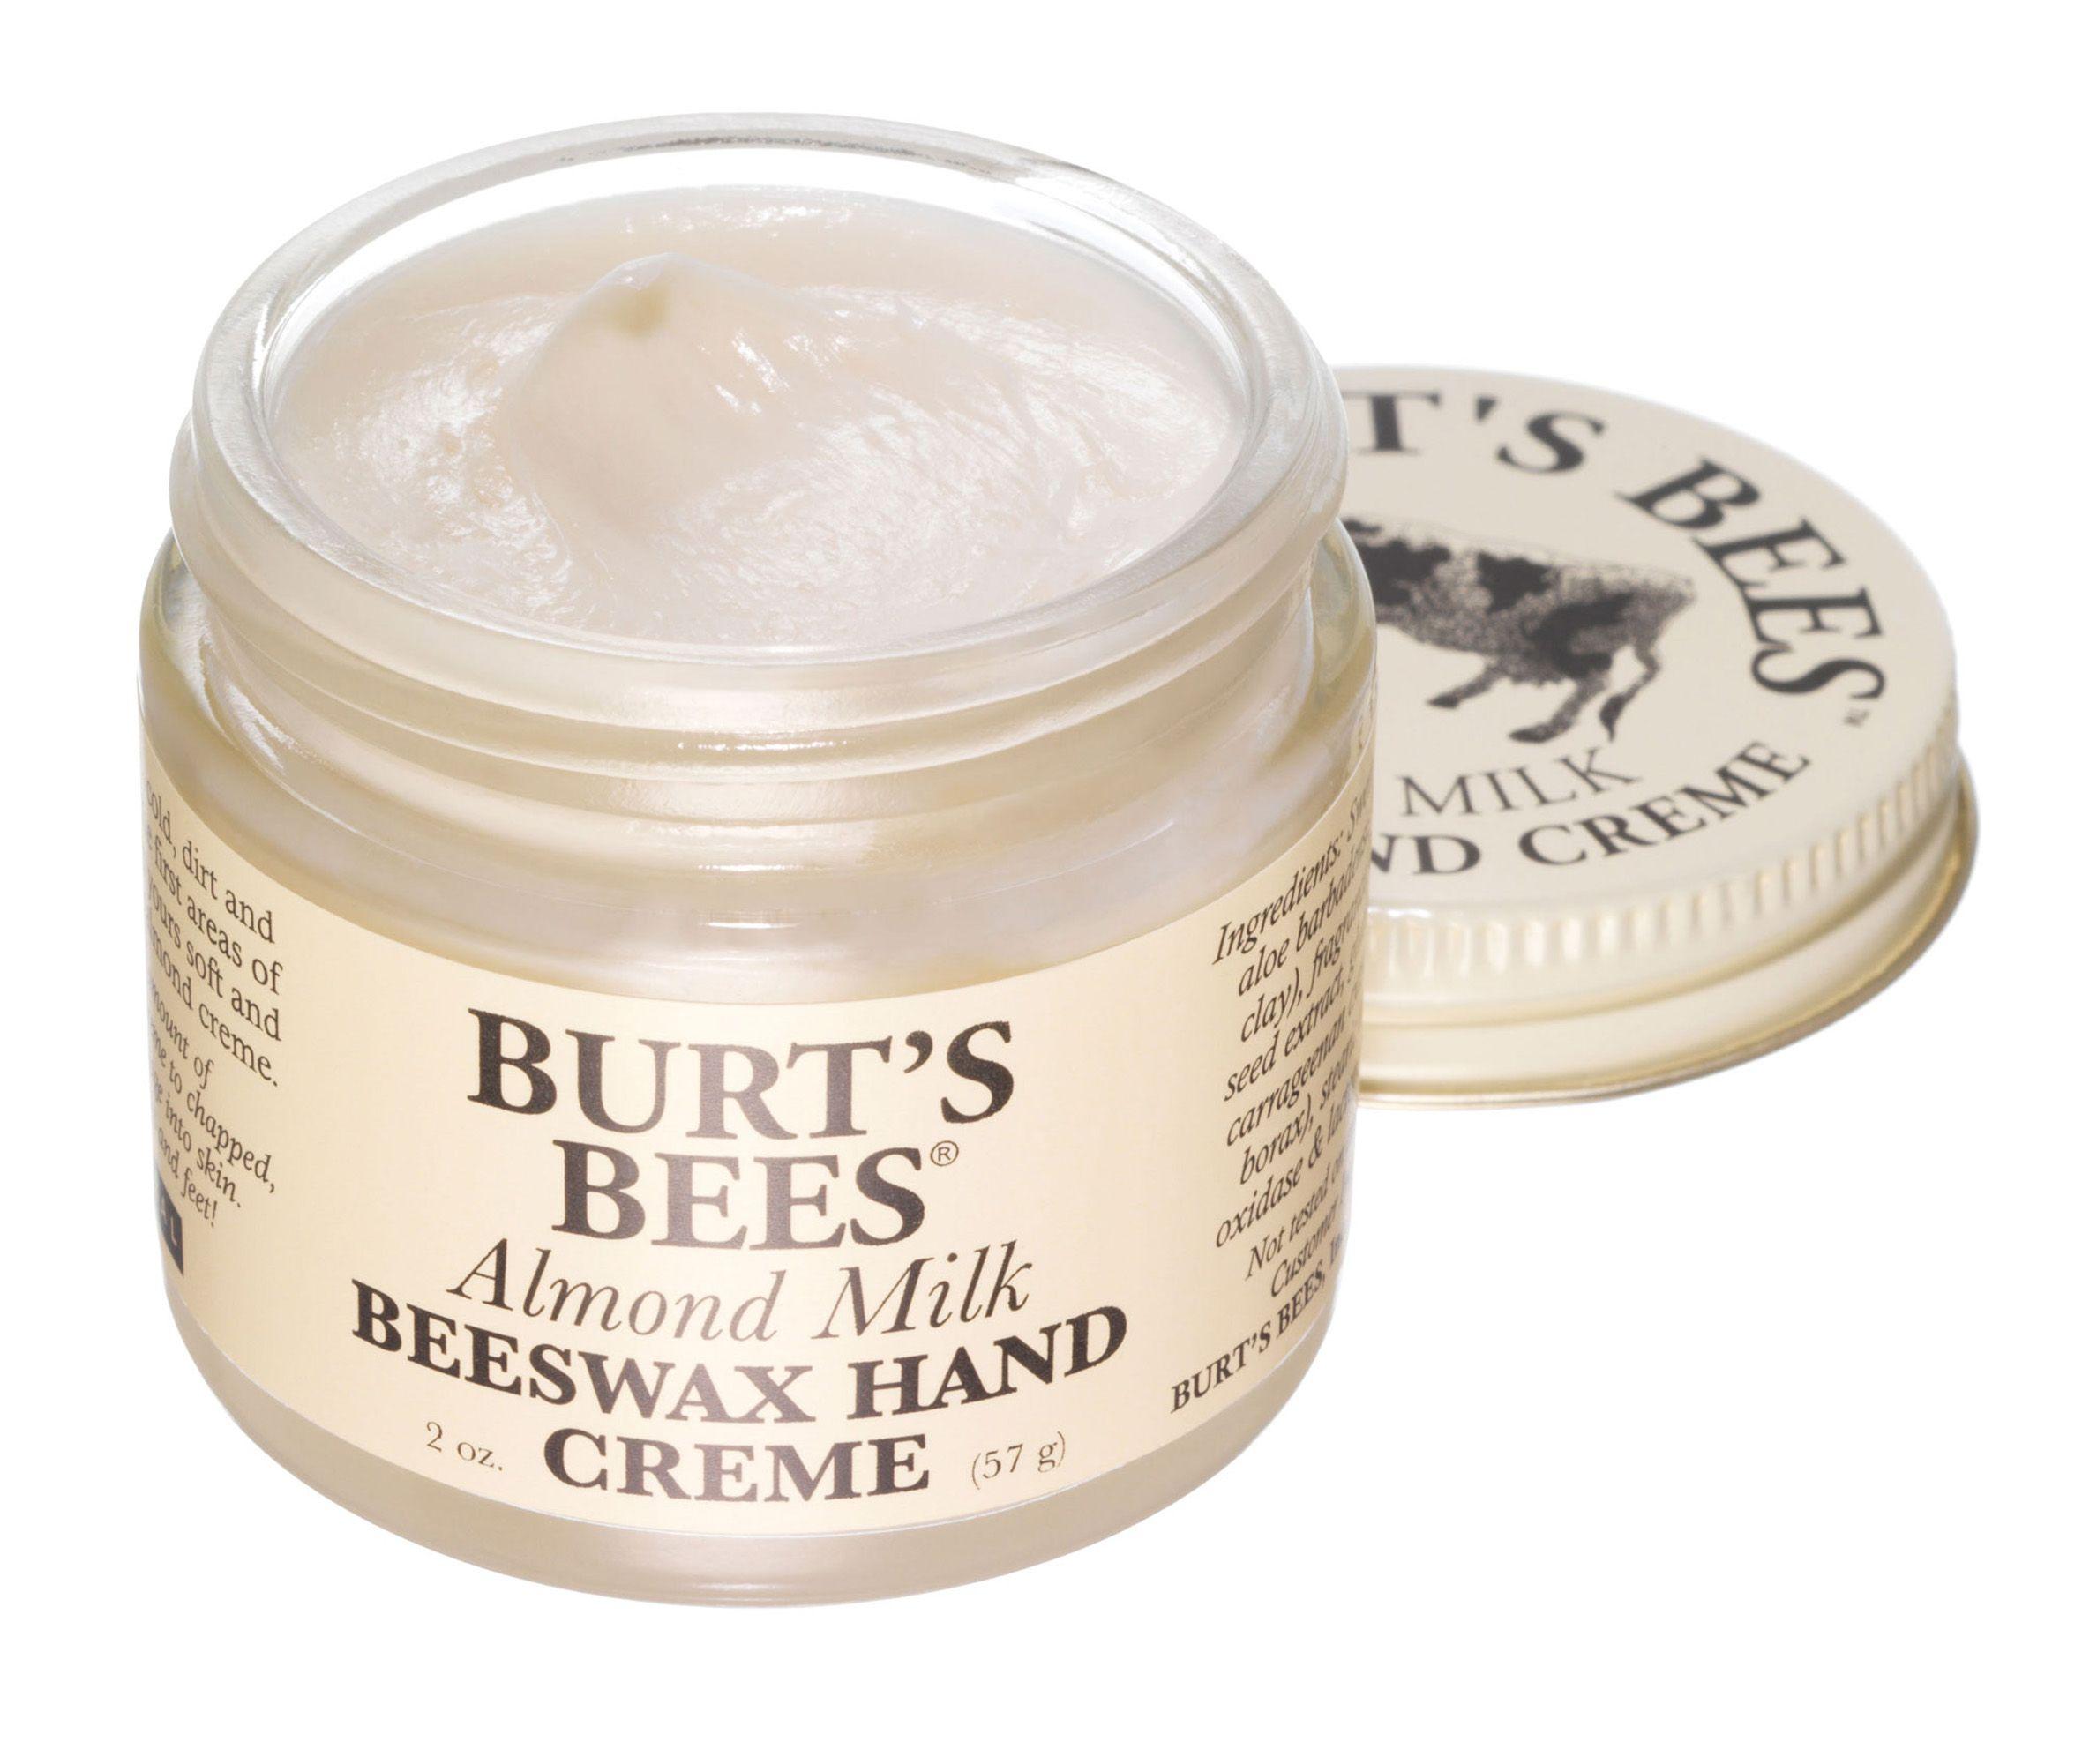 Almond milk beeswax hand cream hand cream cream lotion